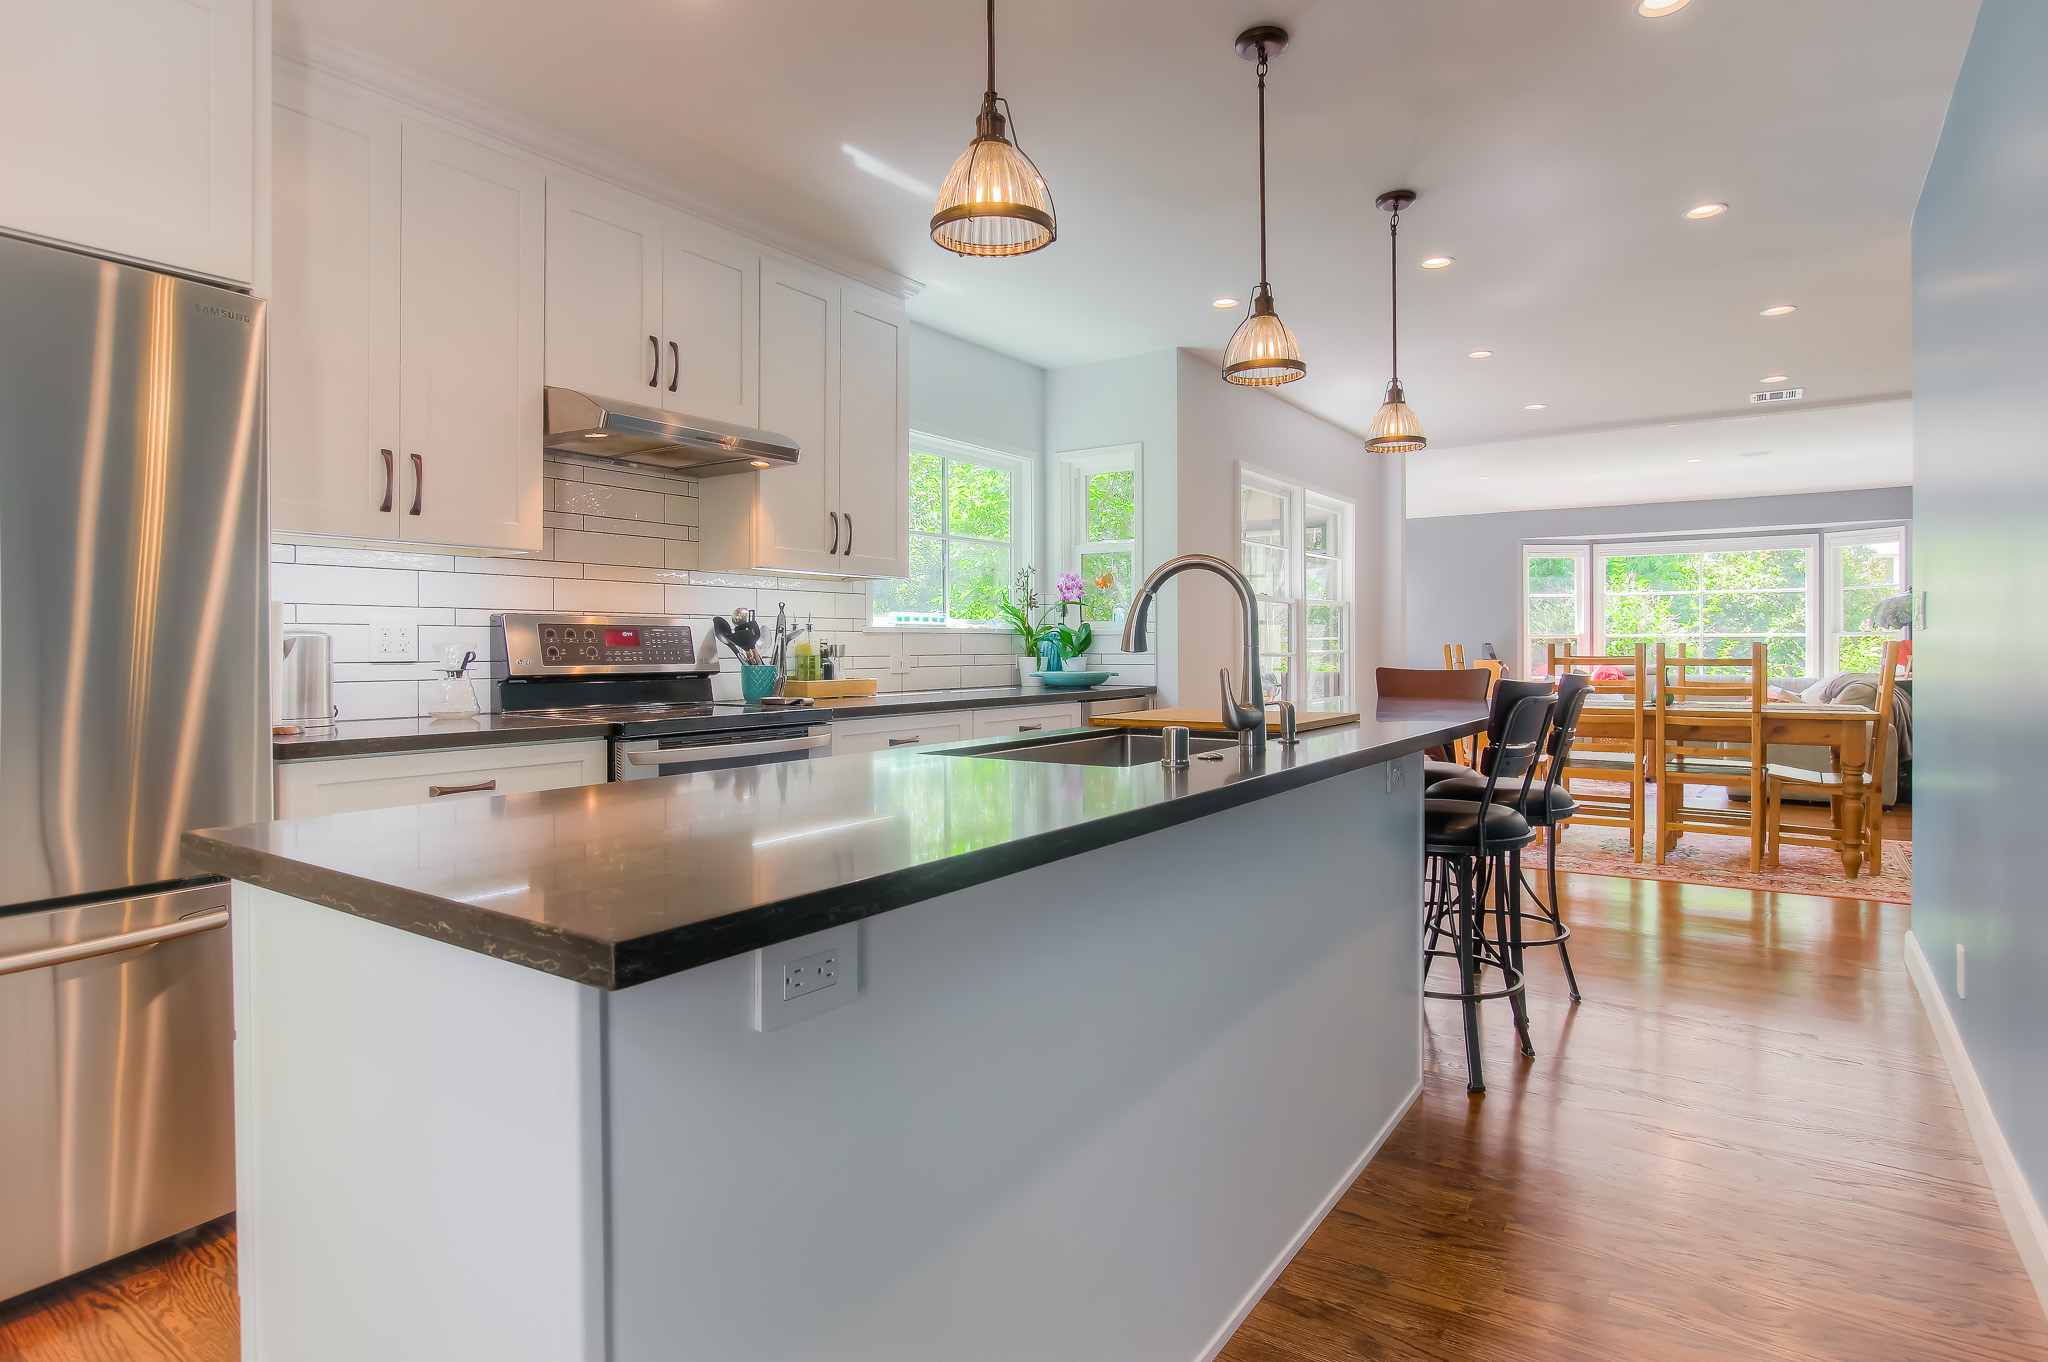 glendale_new_kitchen_side_view.jpg